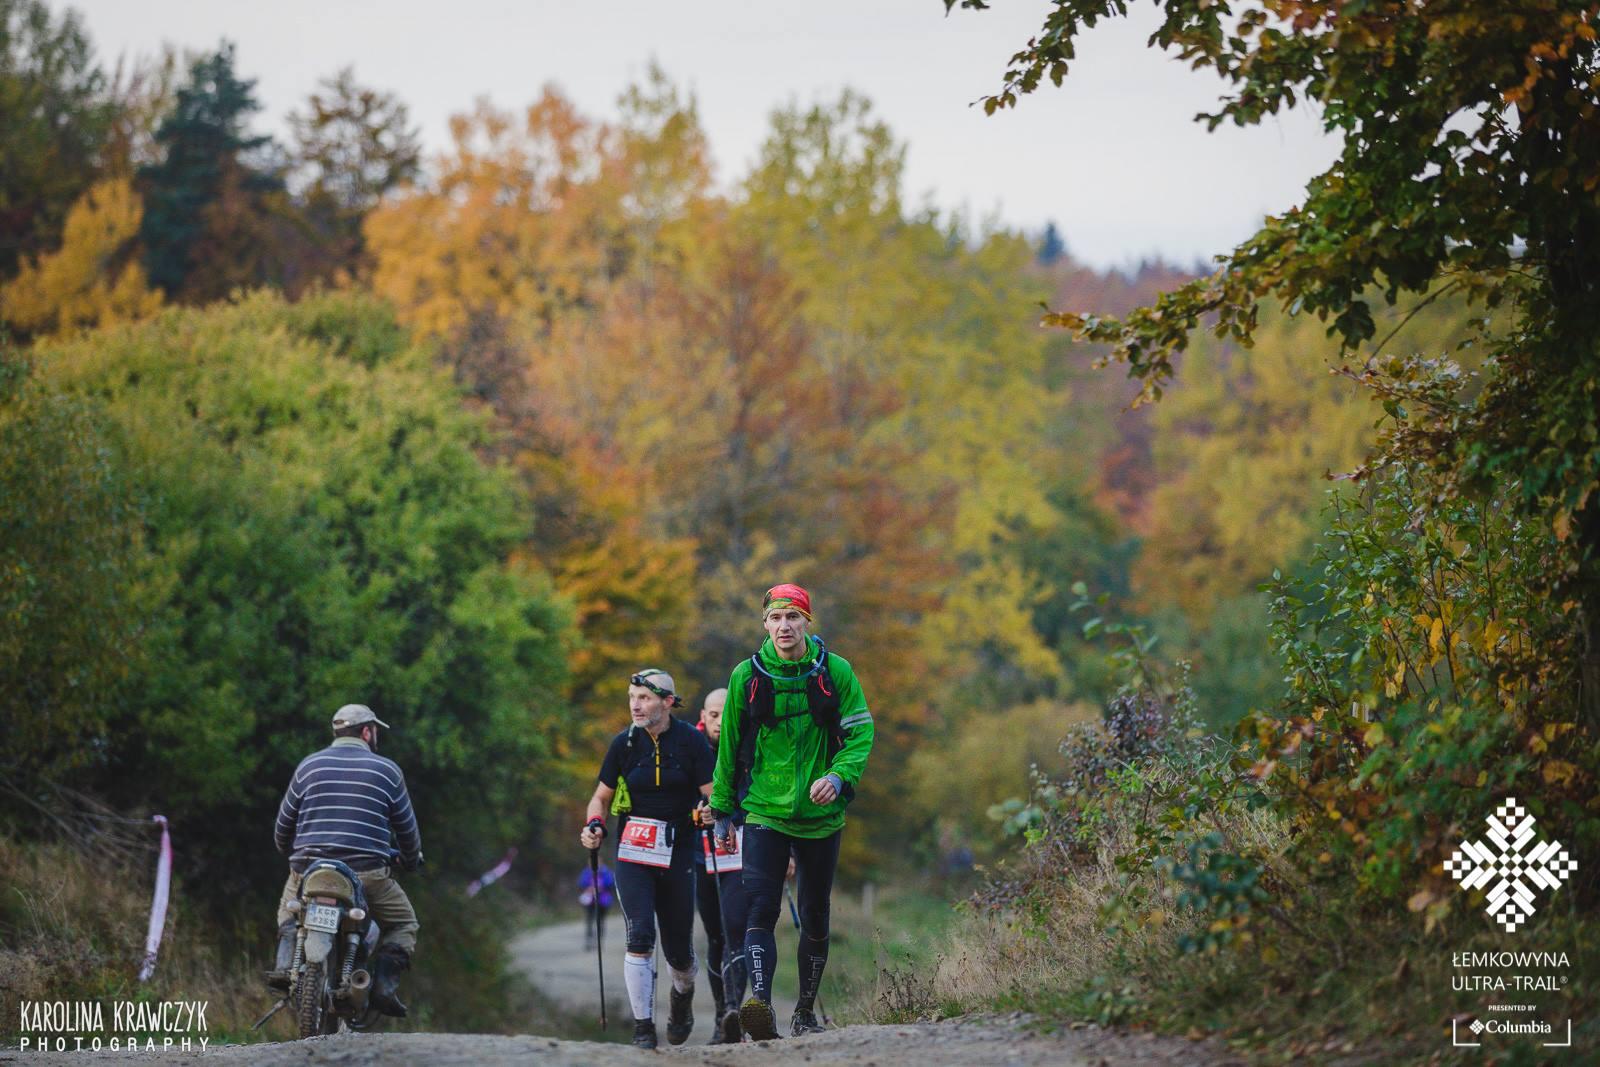 Lemkowyna Ultra Trail - BROsport.sk